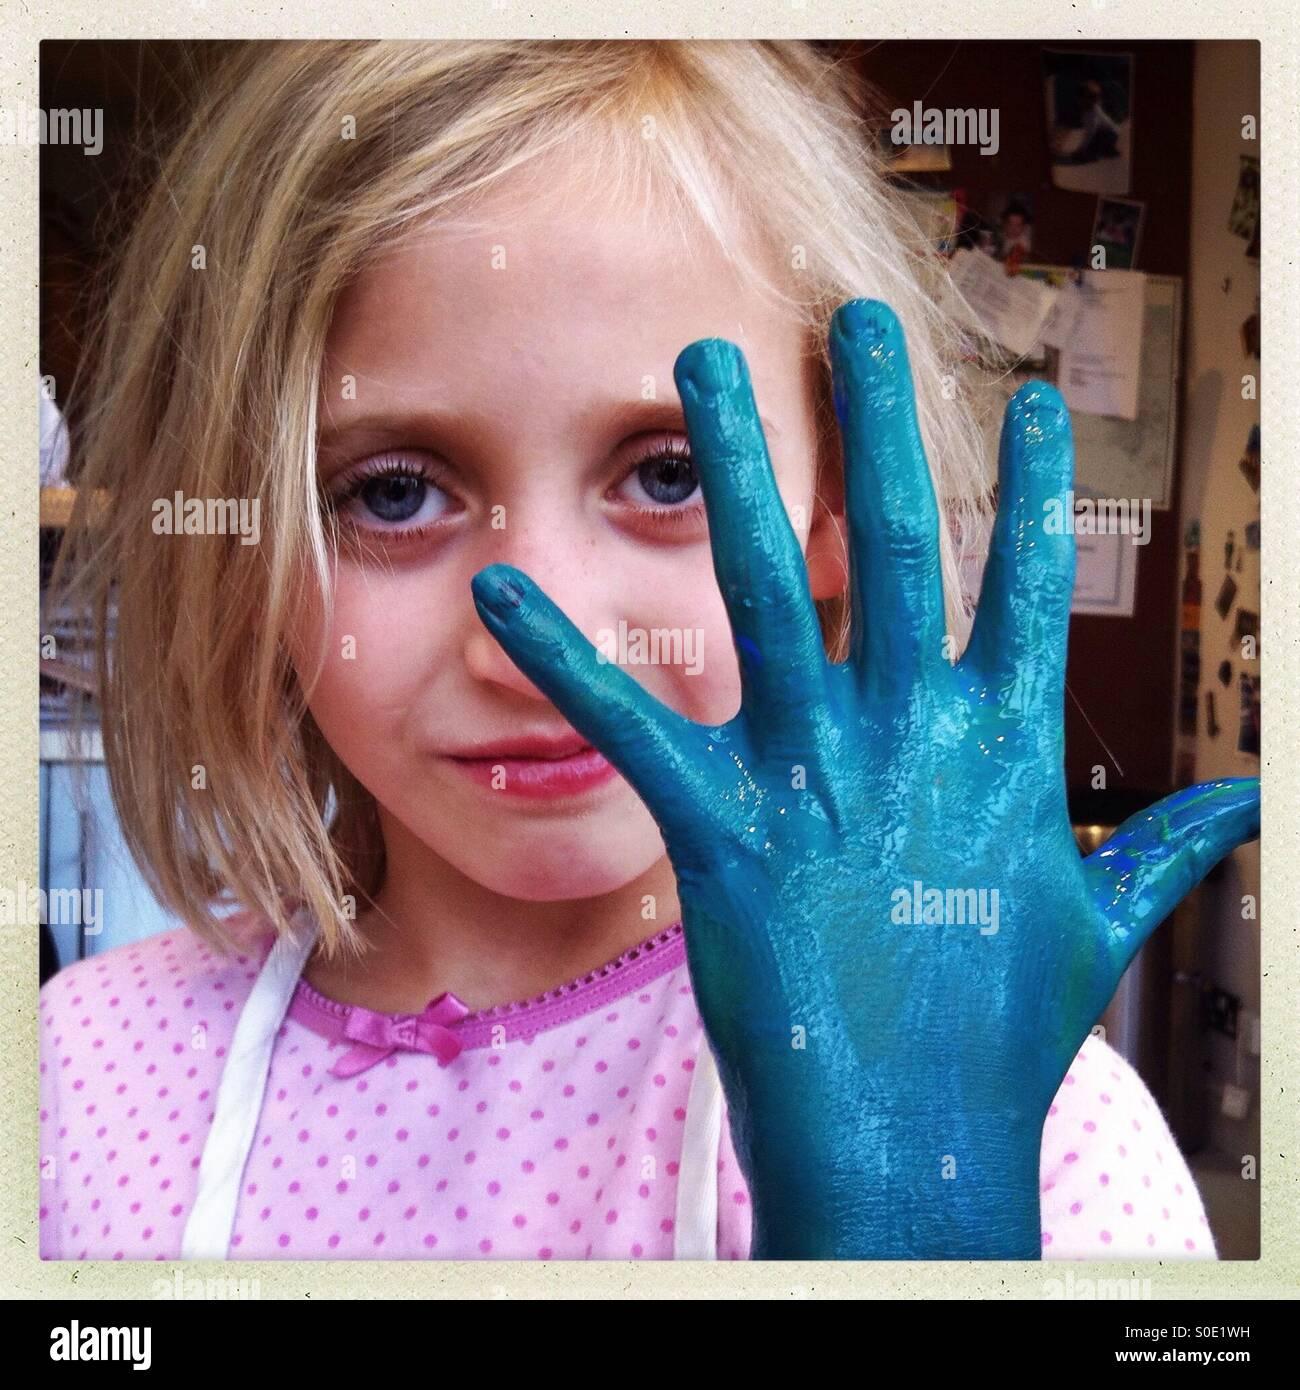 Mano azul Imagen De Stock